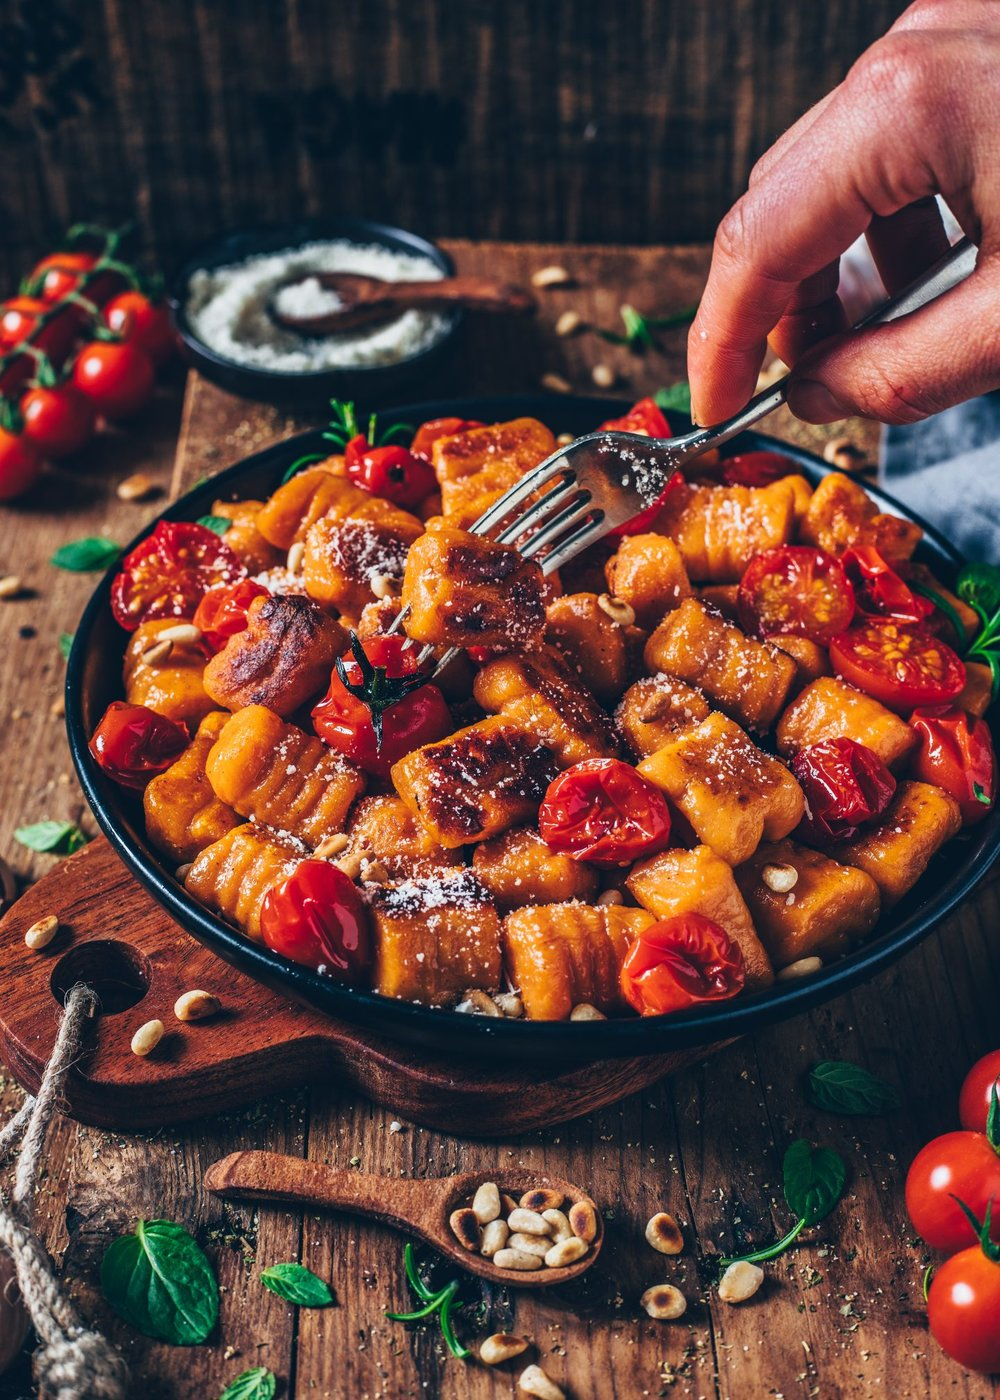 sweet-potato-gnocchi-vegan-easy-recipe-5.jpg